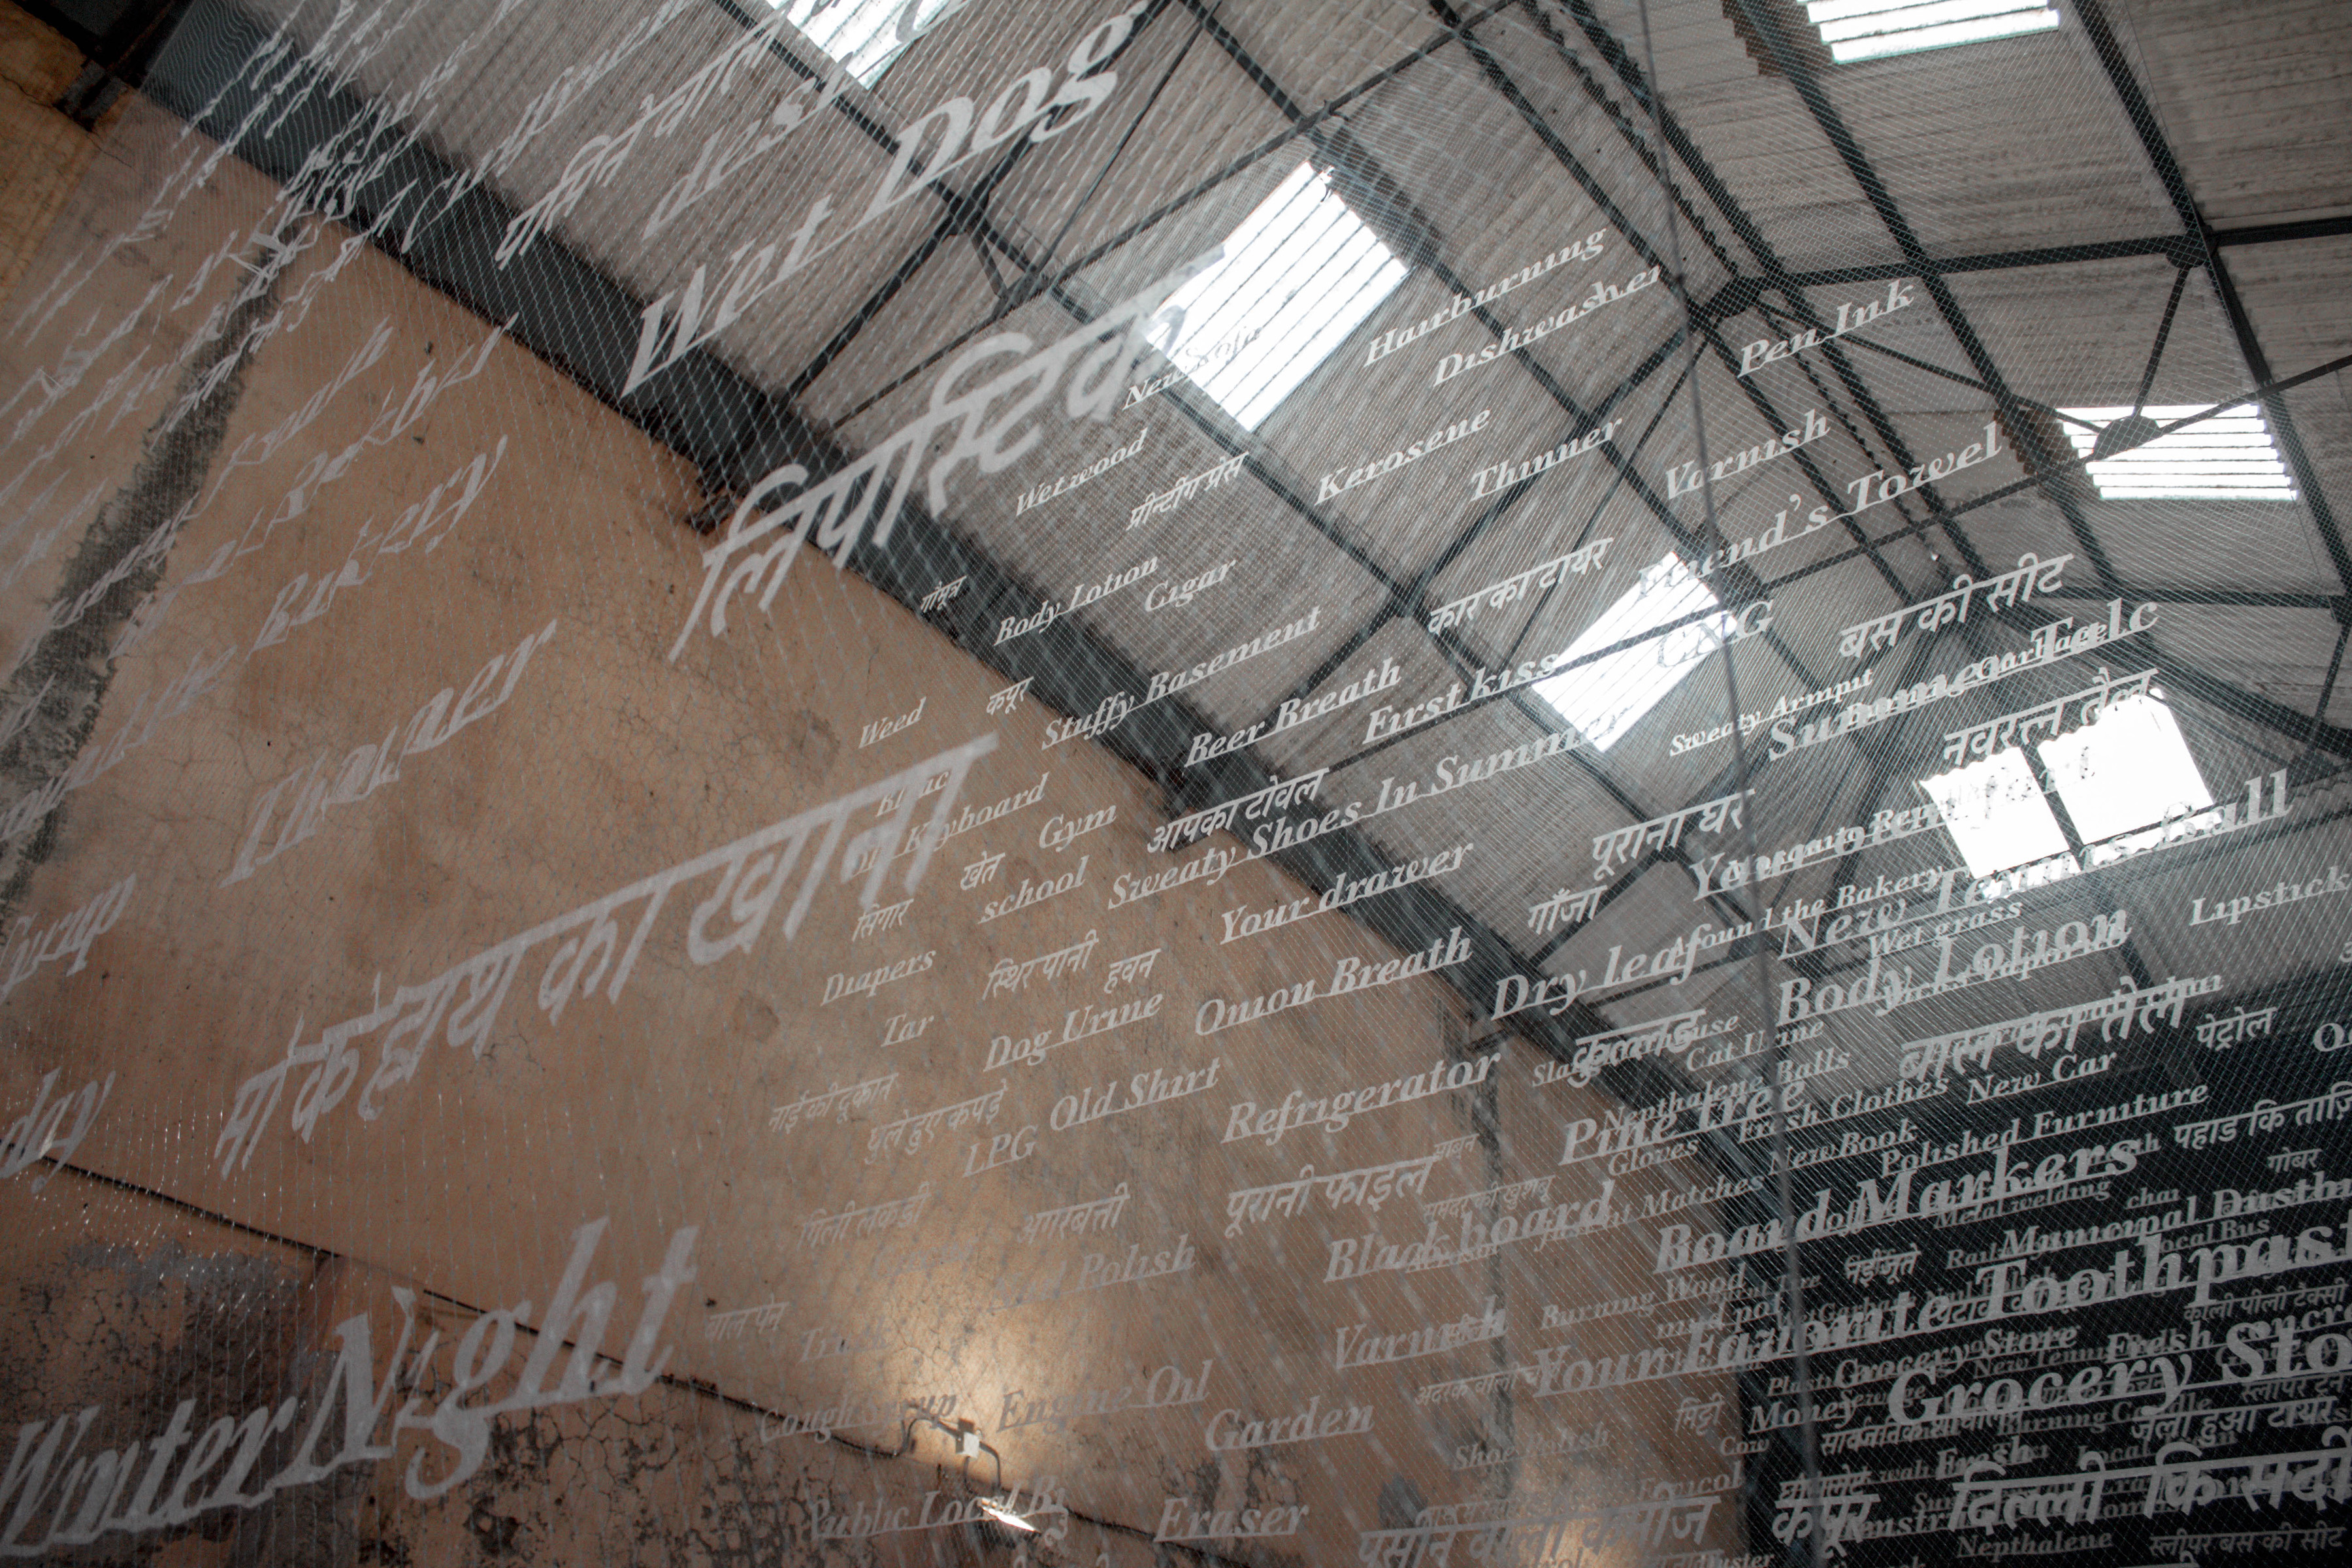 Hanif Kureshi Reveals Sassoon Dock St Art Mumbai 2017 Pranav Gohil 8